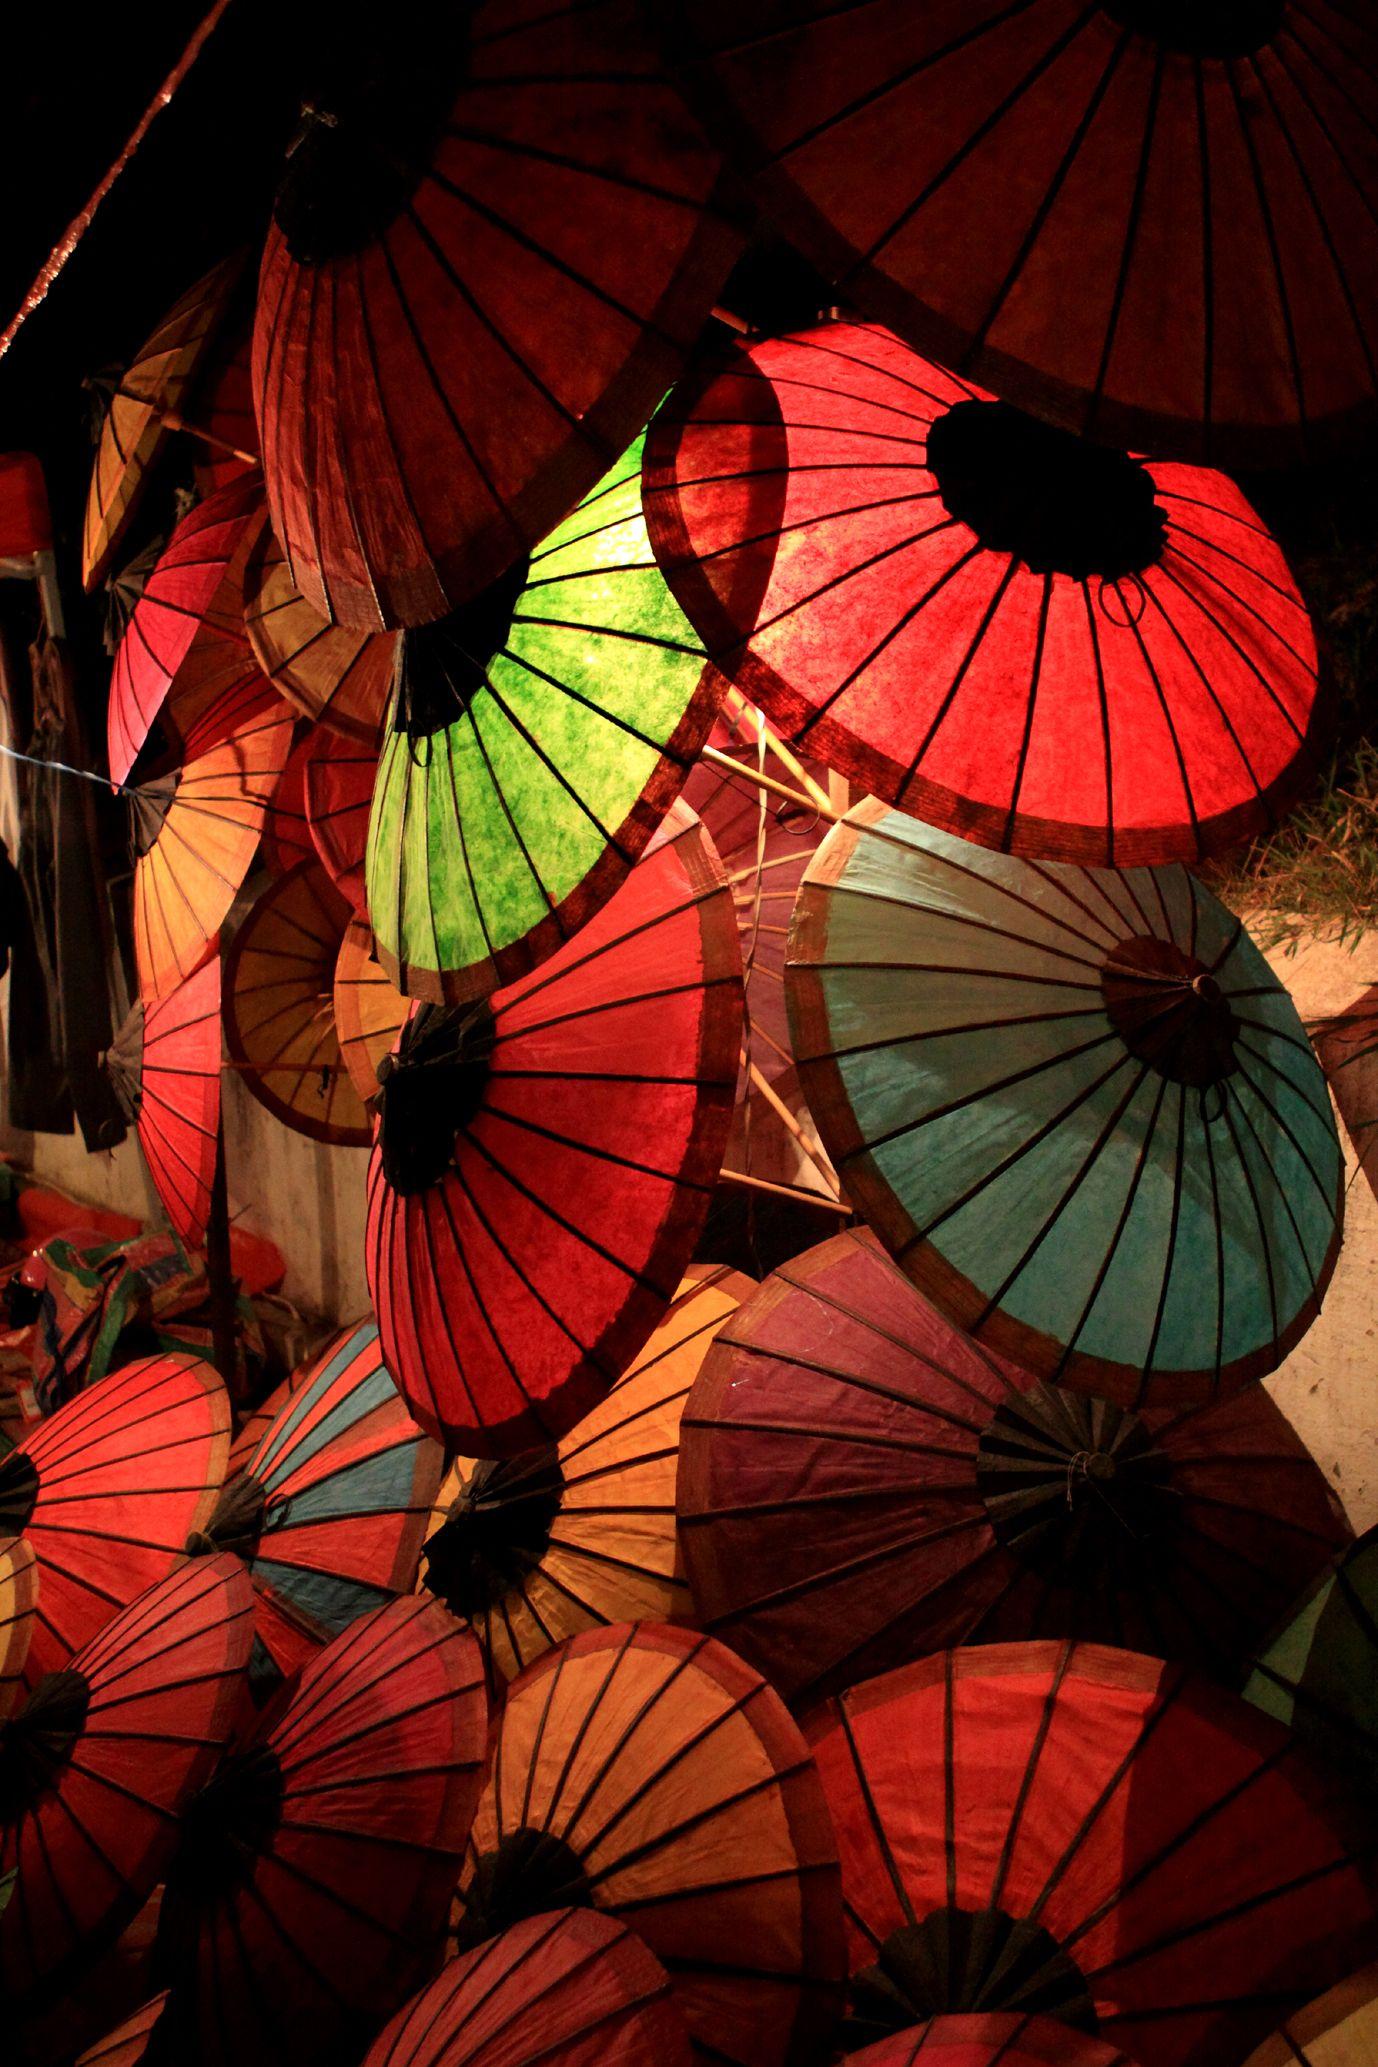 Laos » Luang Prabang » Umbrellas